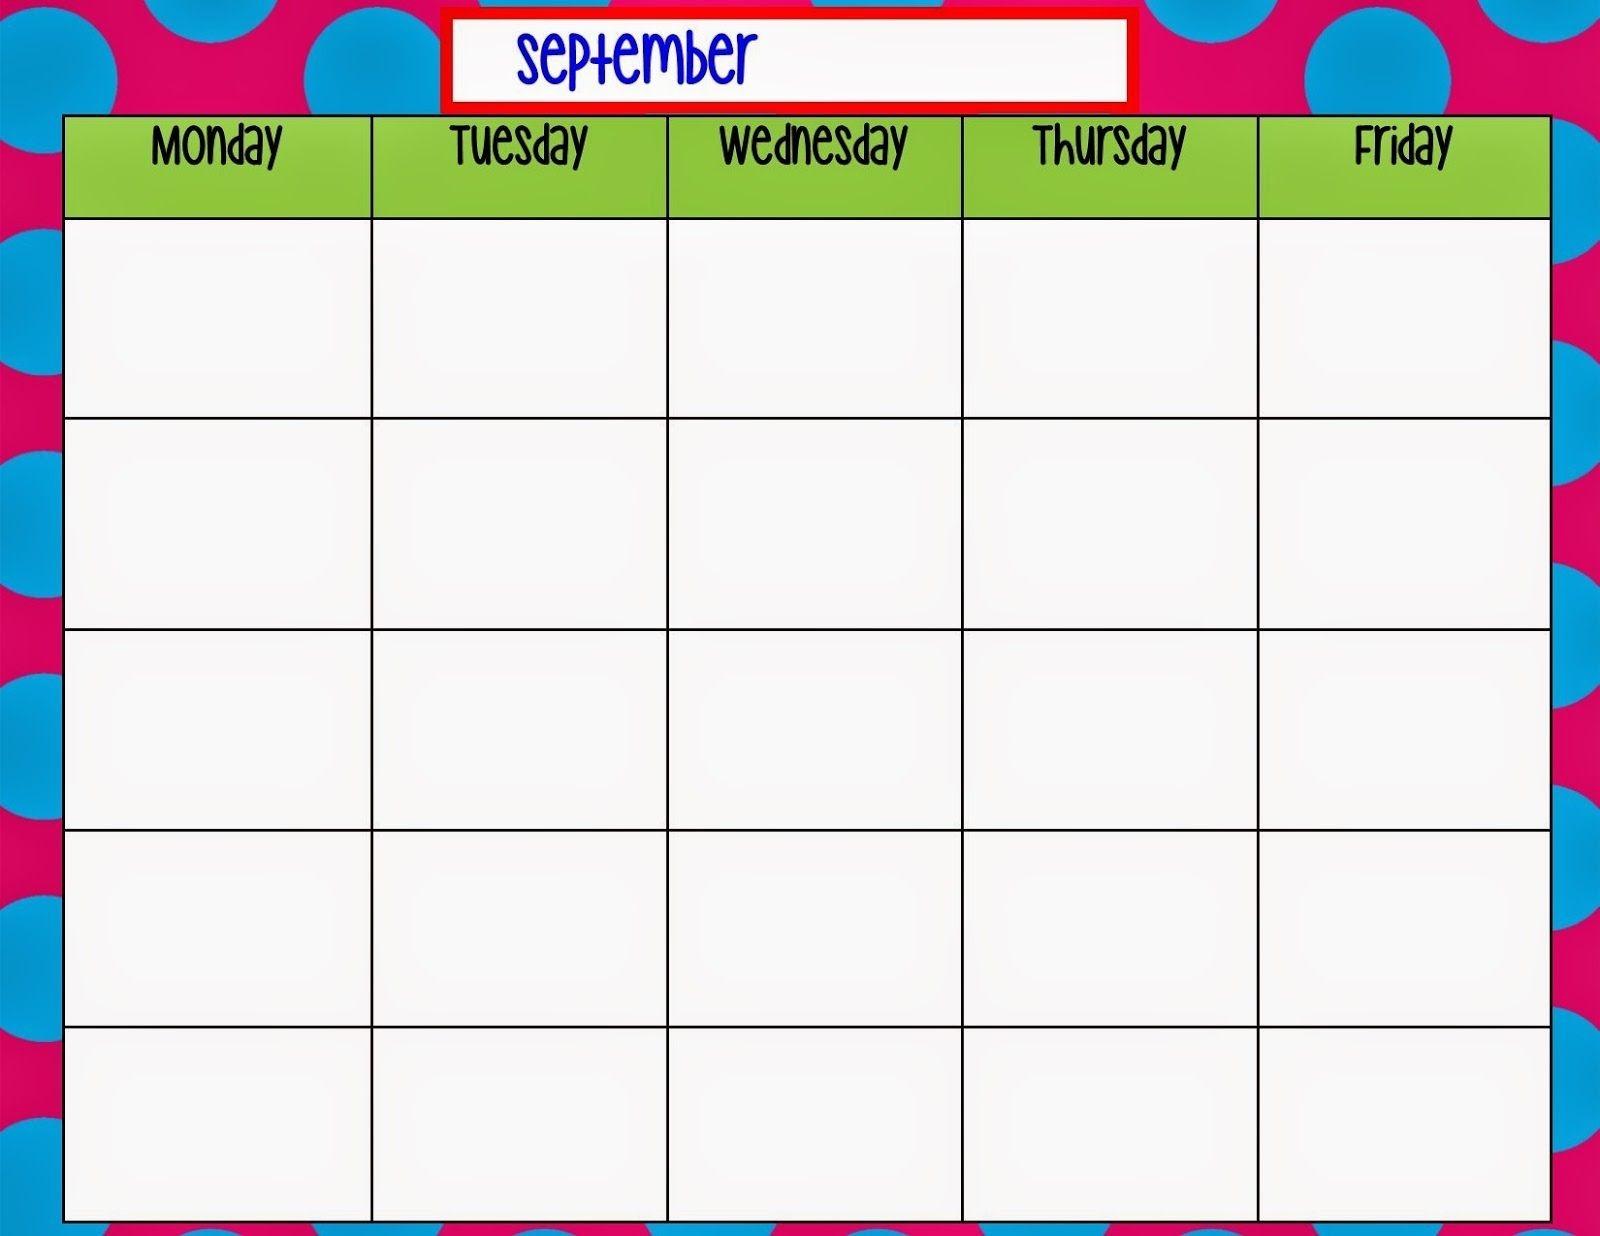 Monday Through Friday Planning Template | Calendar  Monday Through Friday Schedule